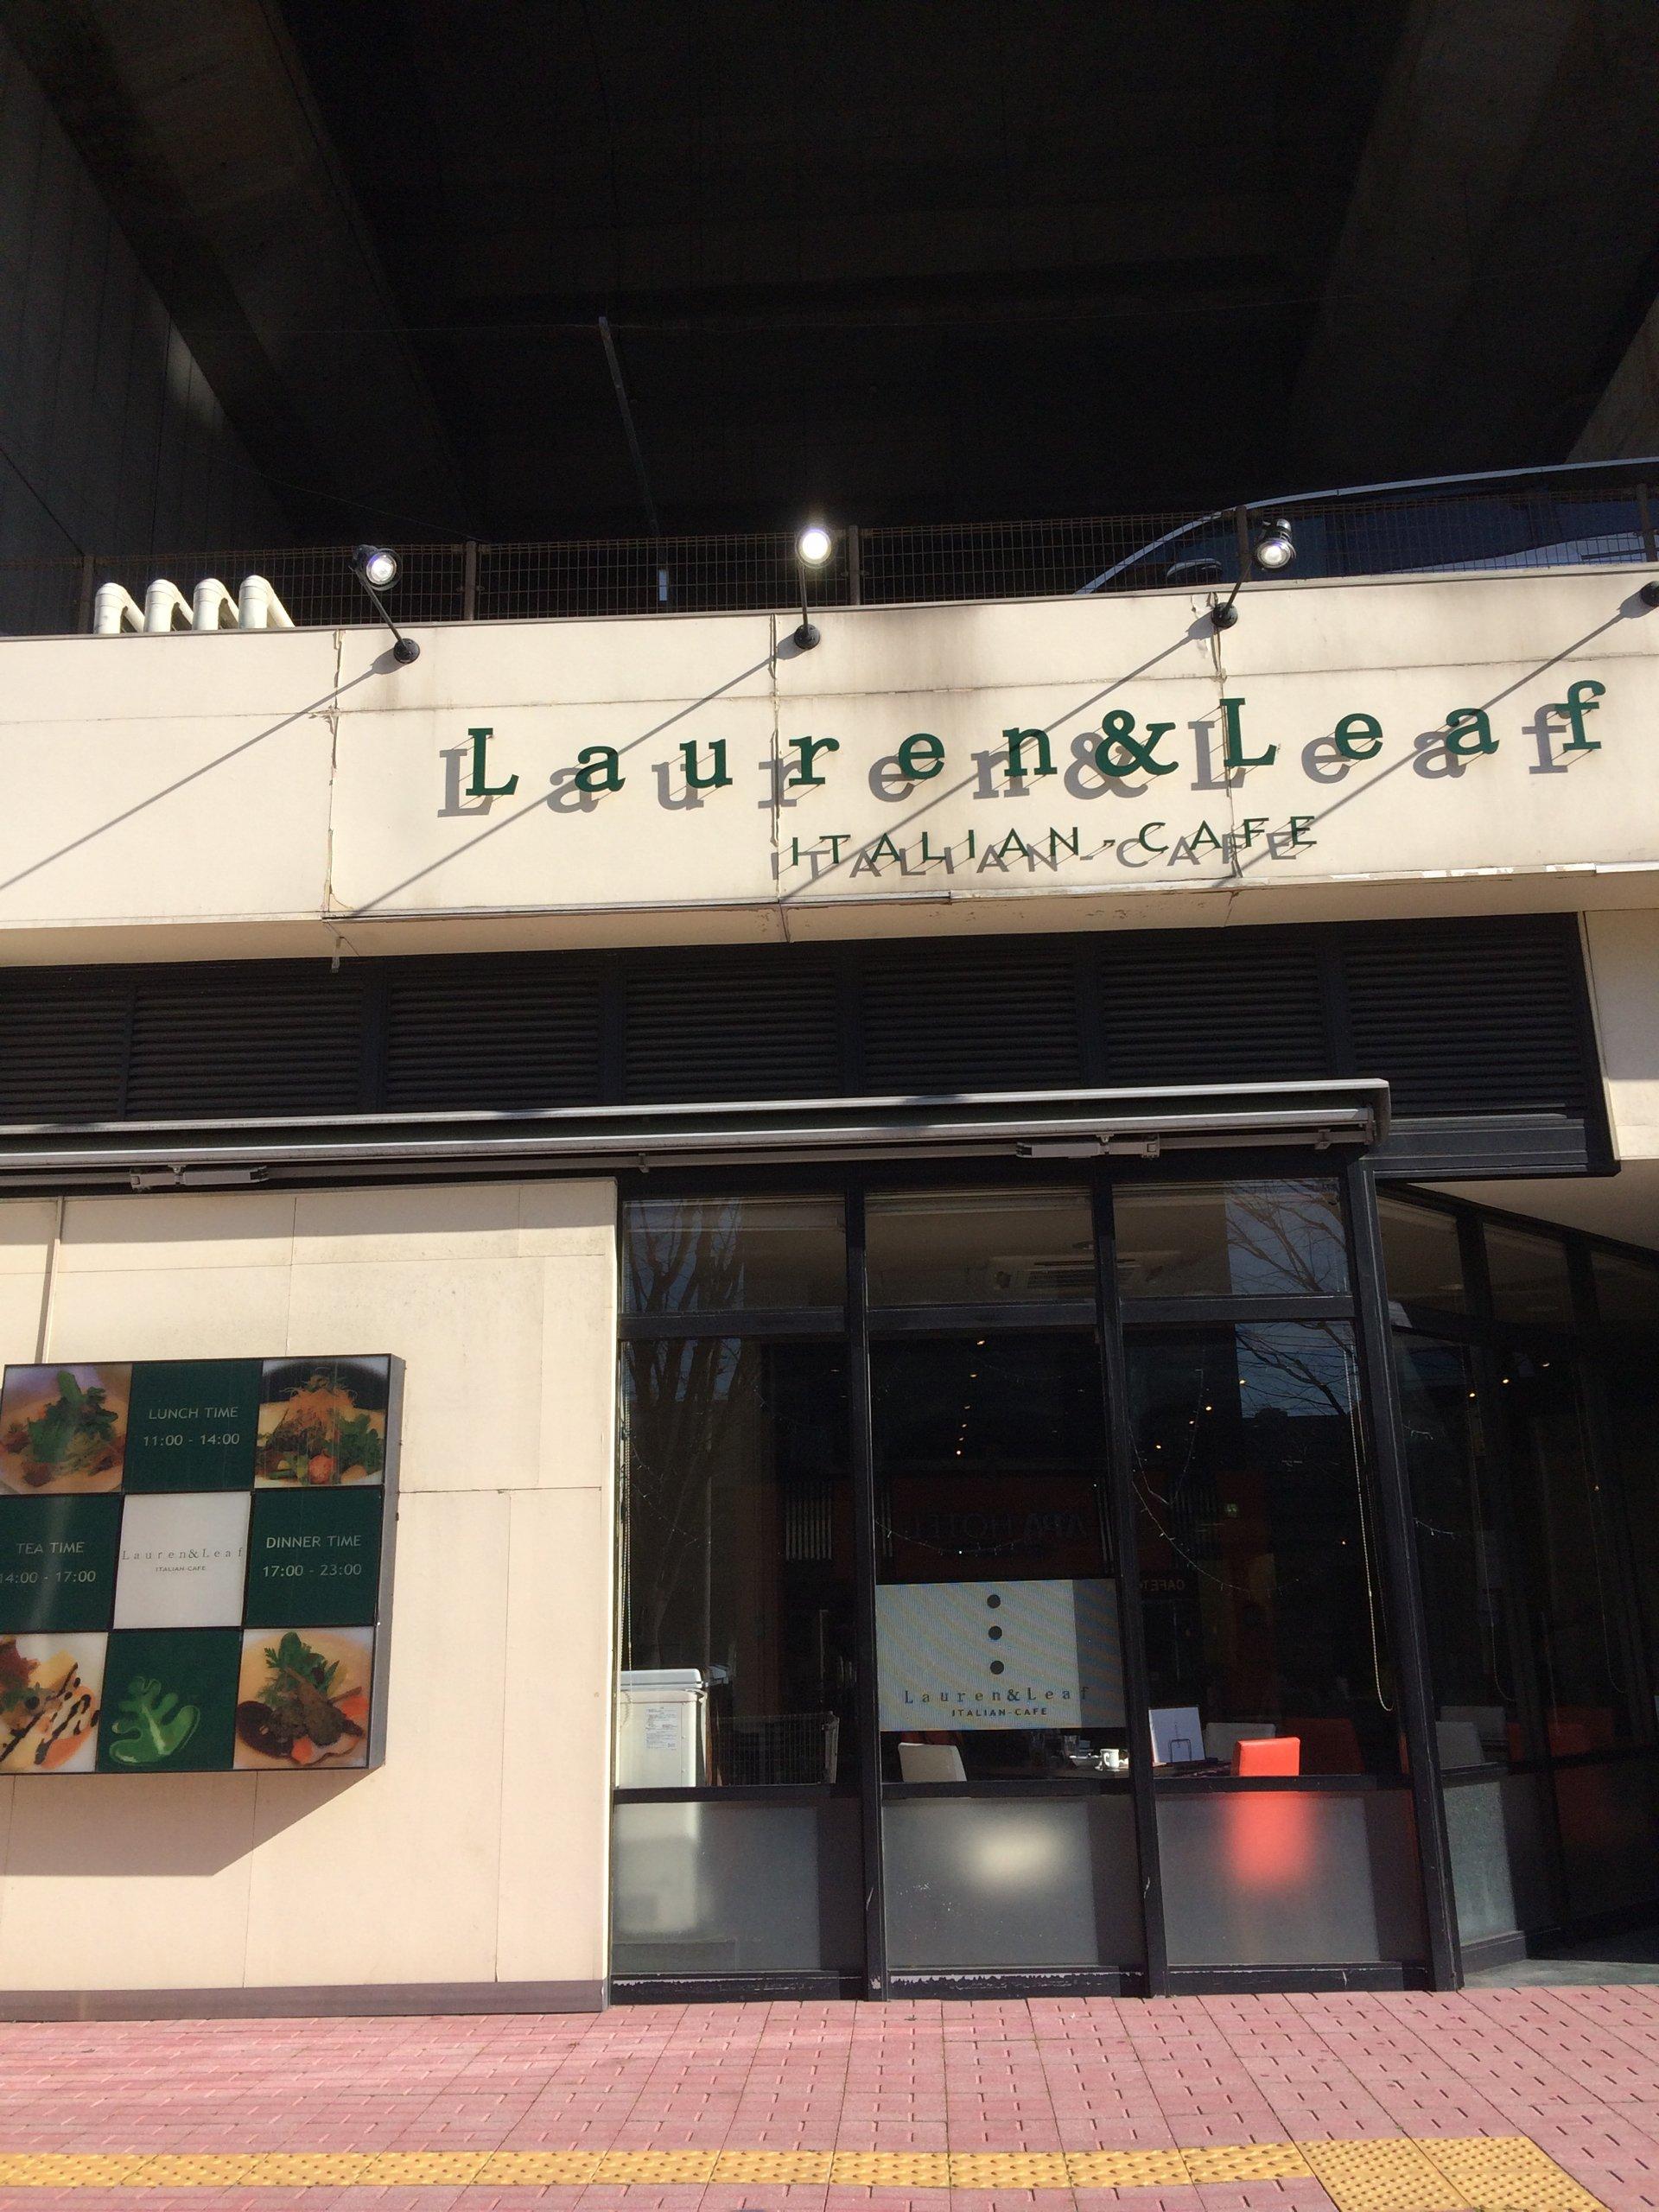 Lauren&Leaf (ローレン&リーフ)|公式HP・福島市・駅ナカ・イタリアン・パーティー